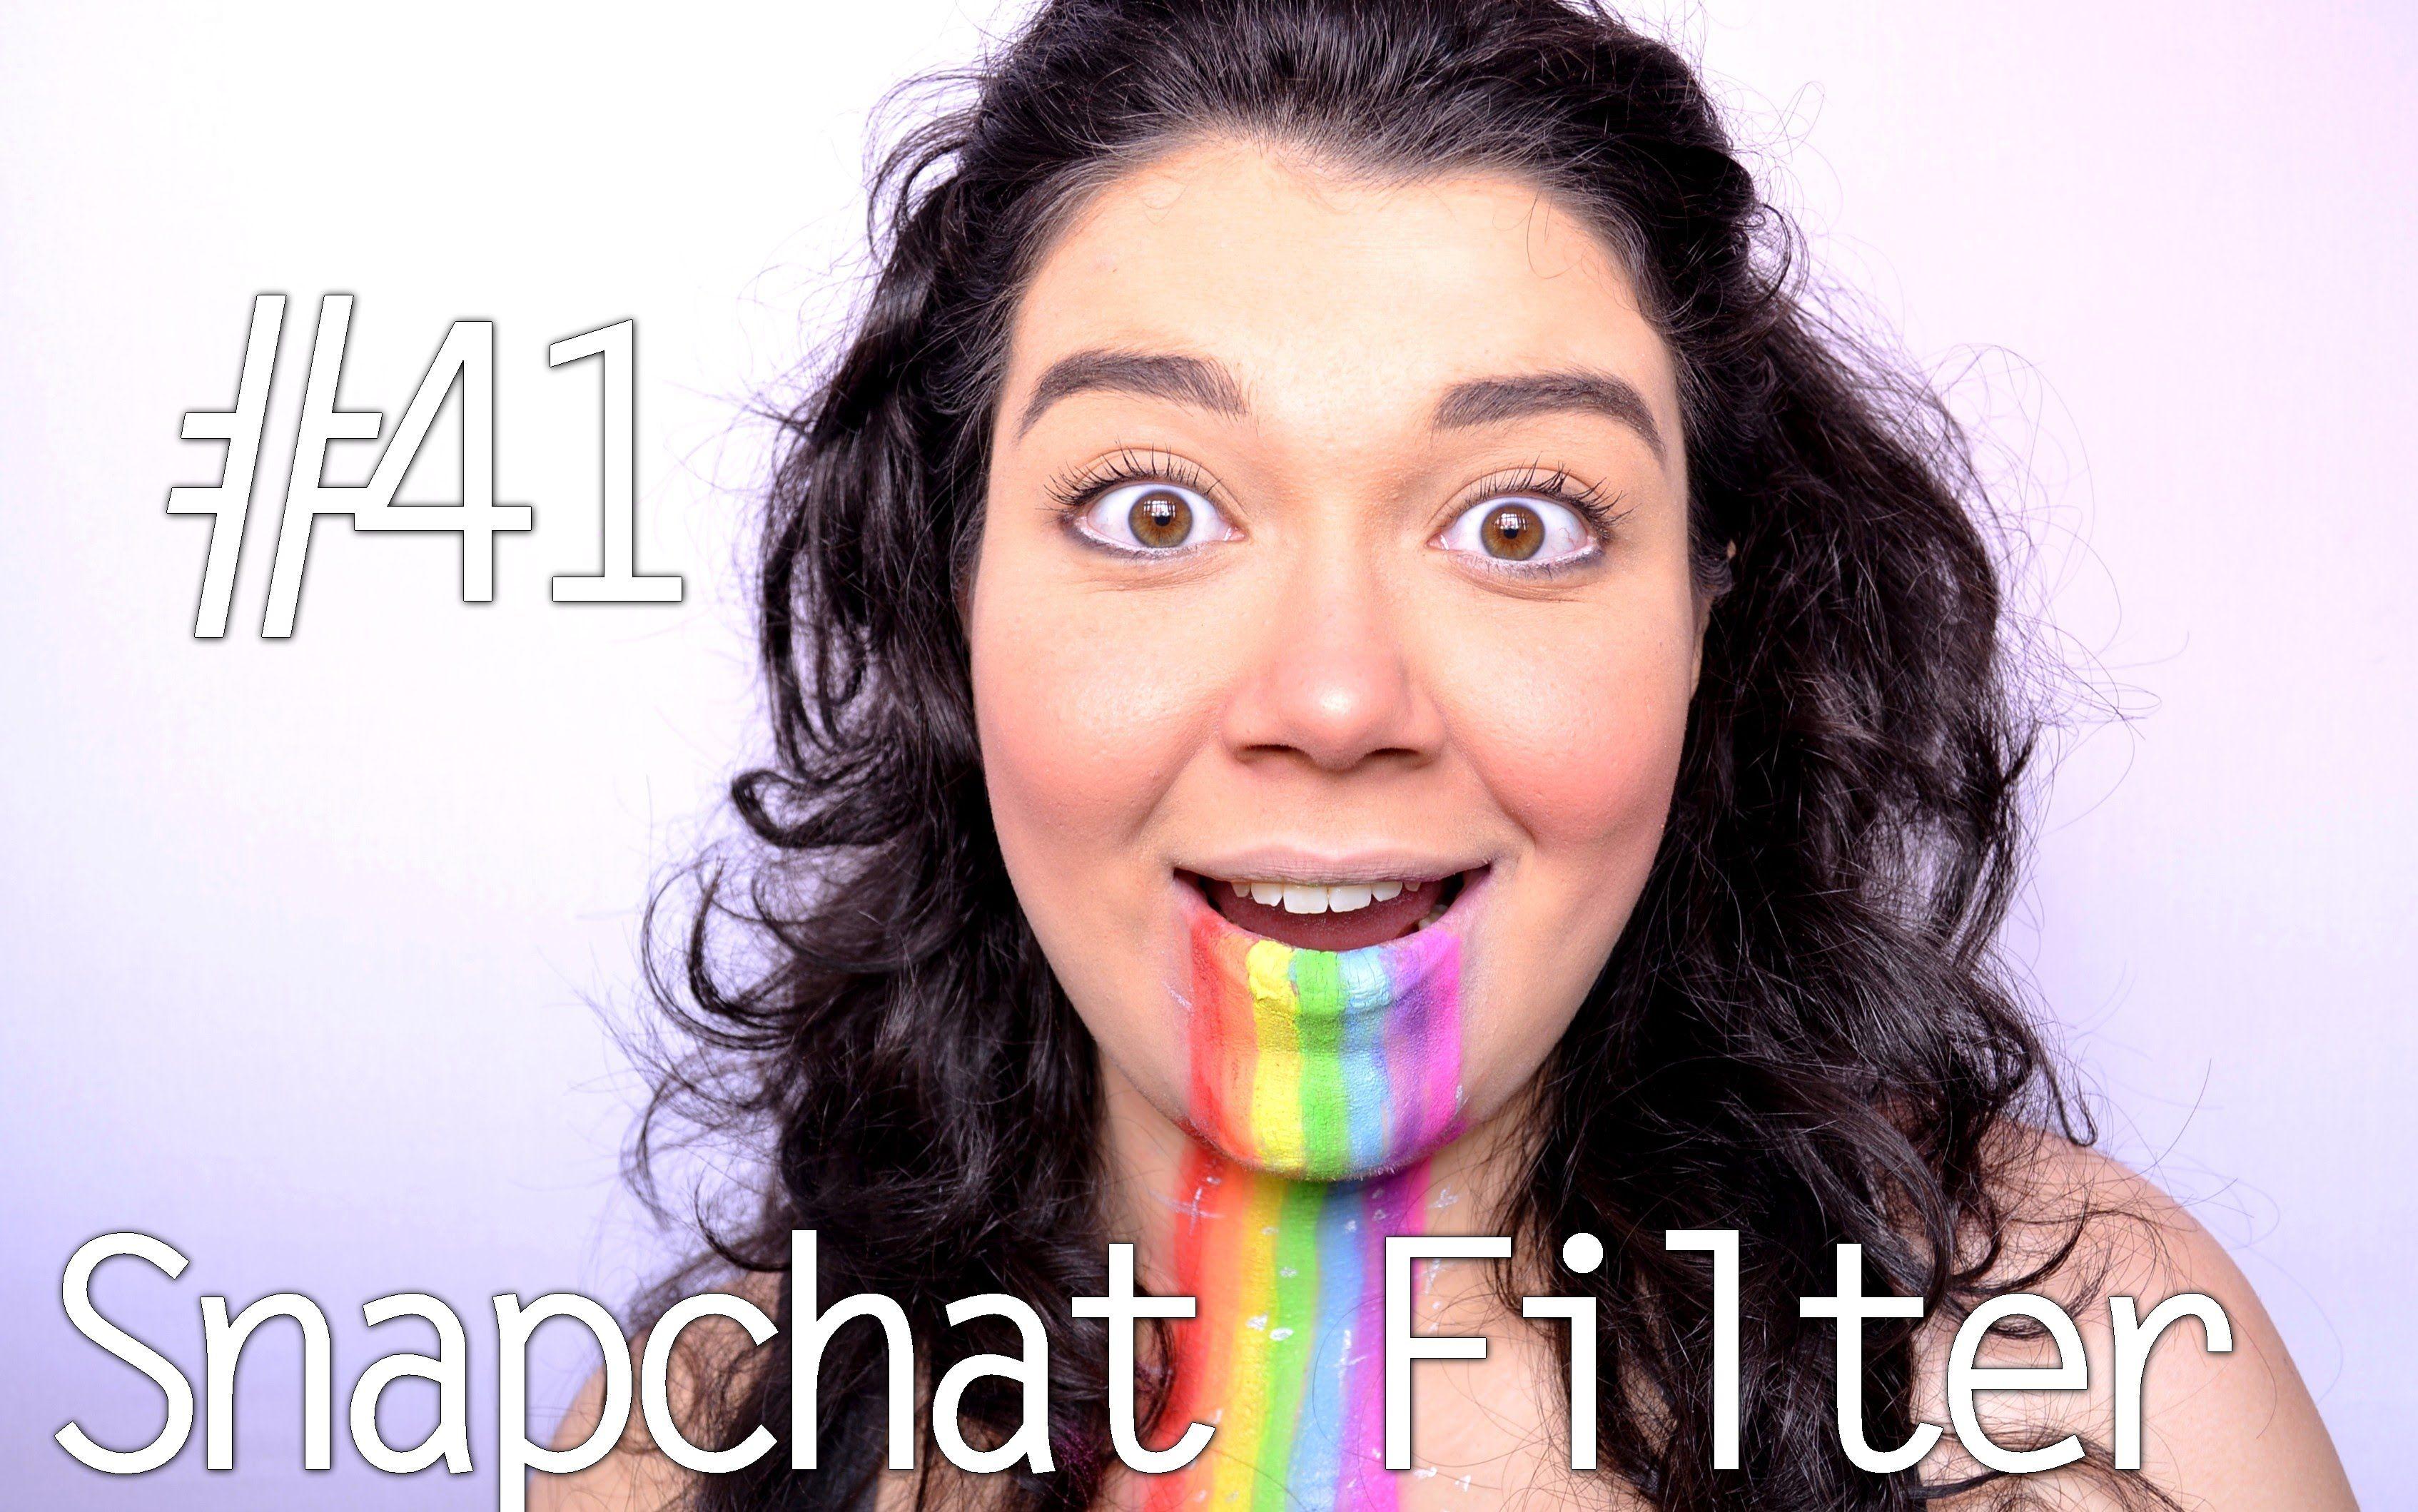 Snapchat Filter Makeup Tutorial Tutorial maquiagem